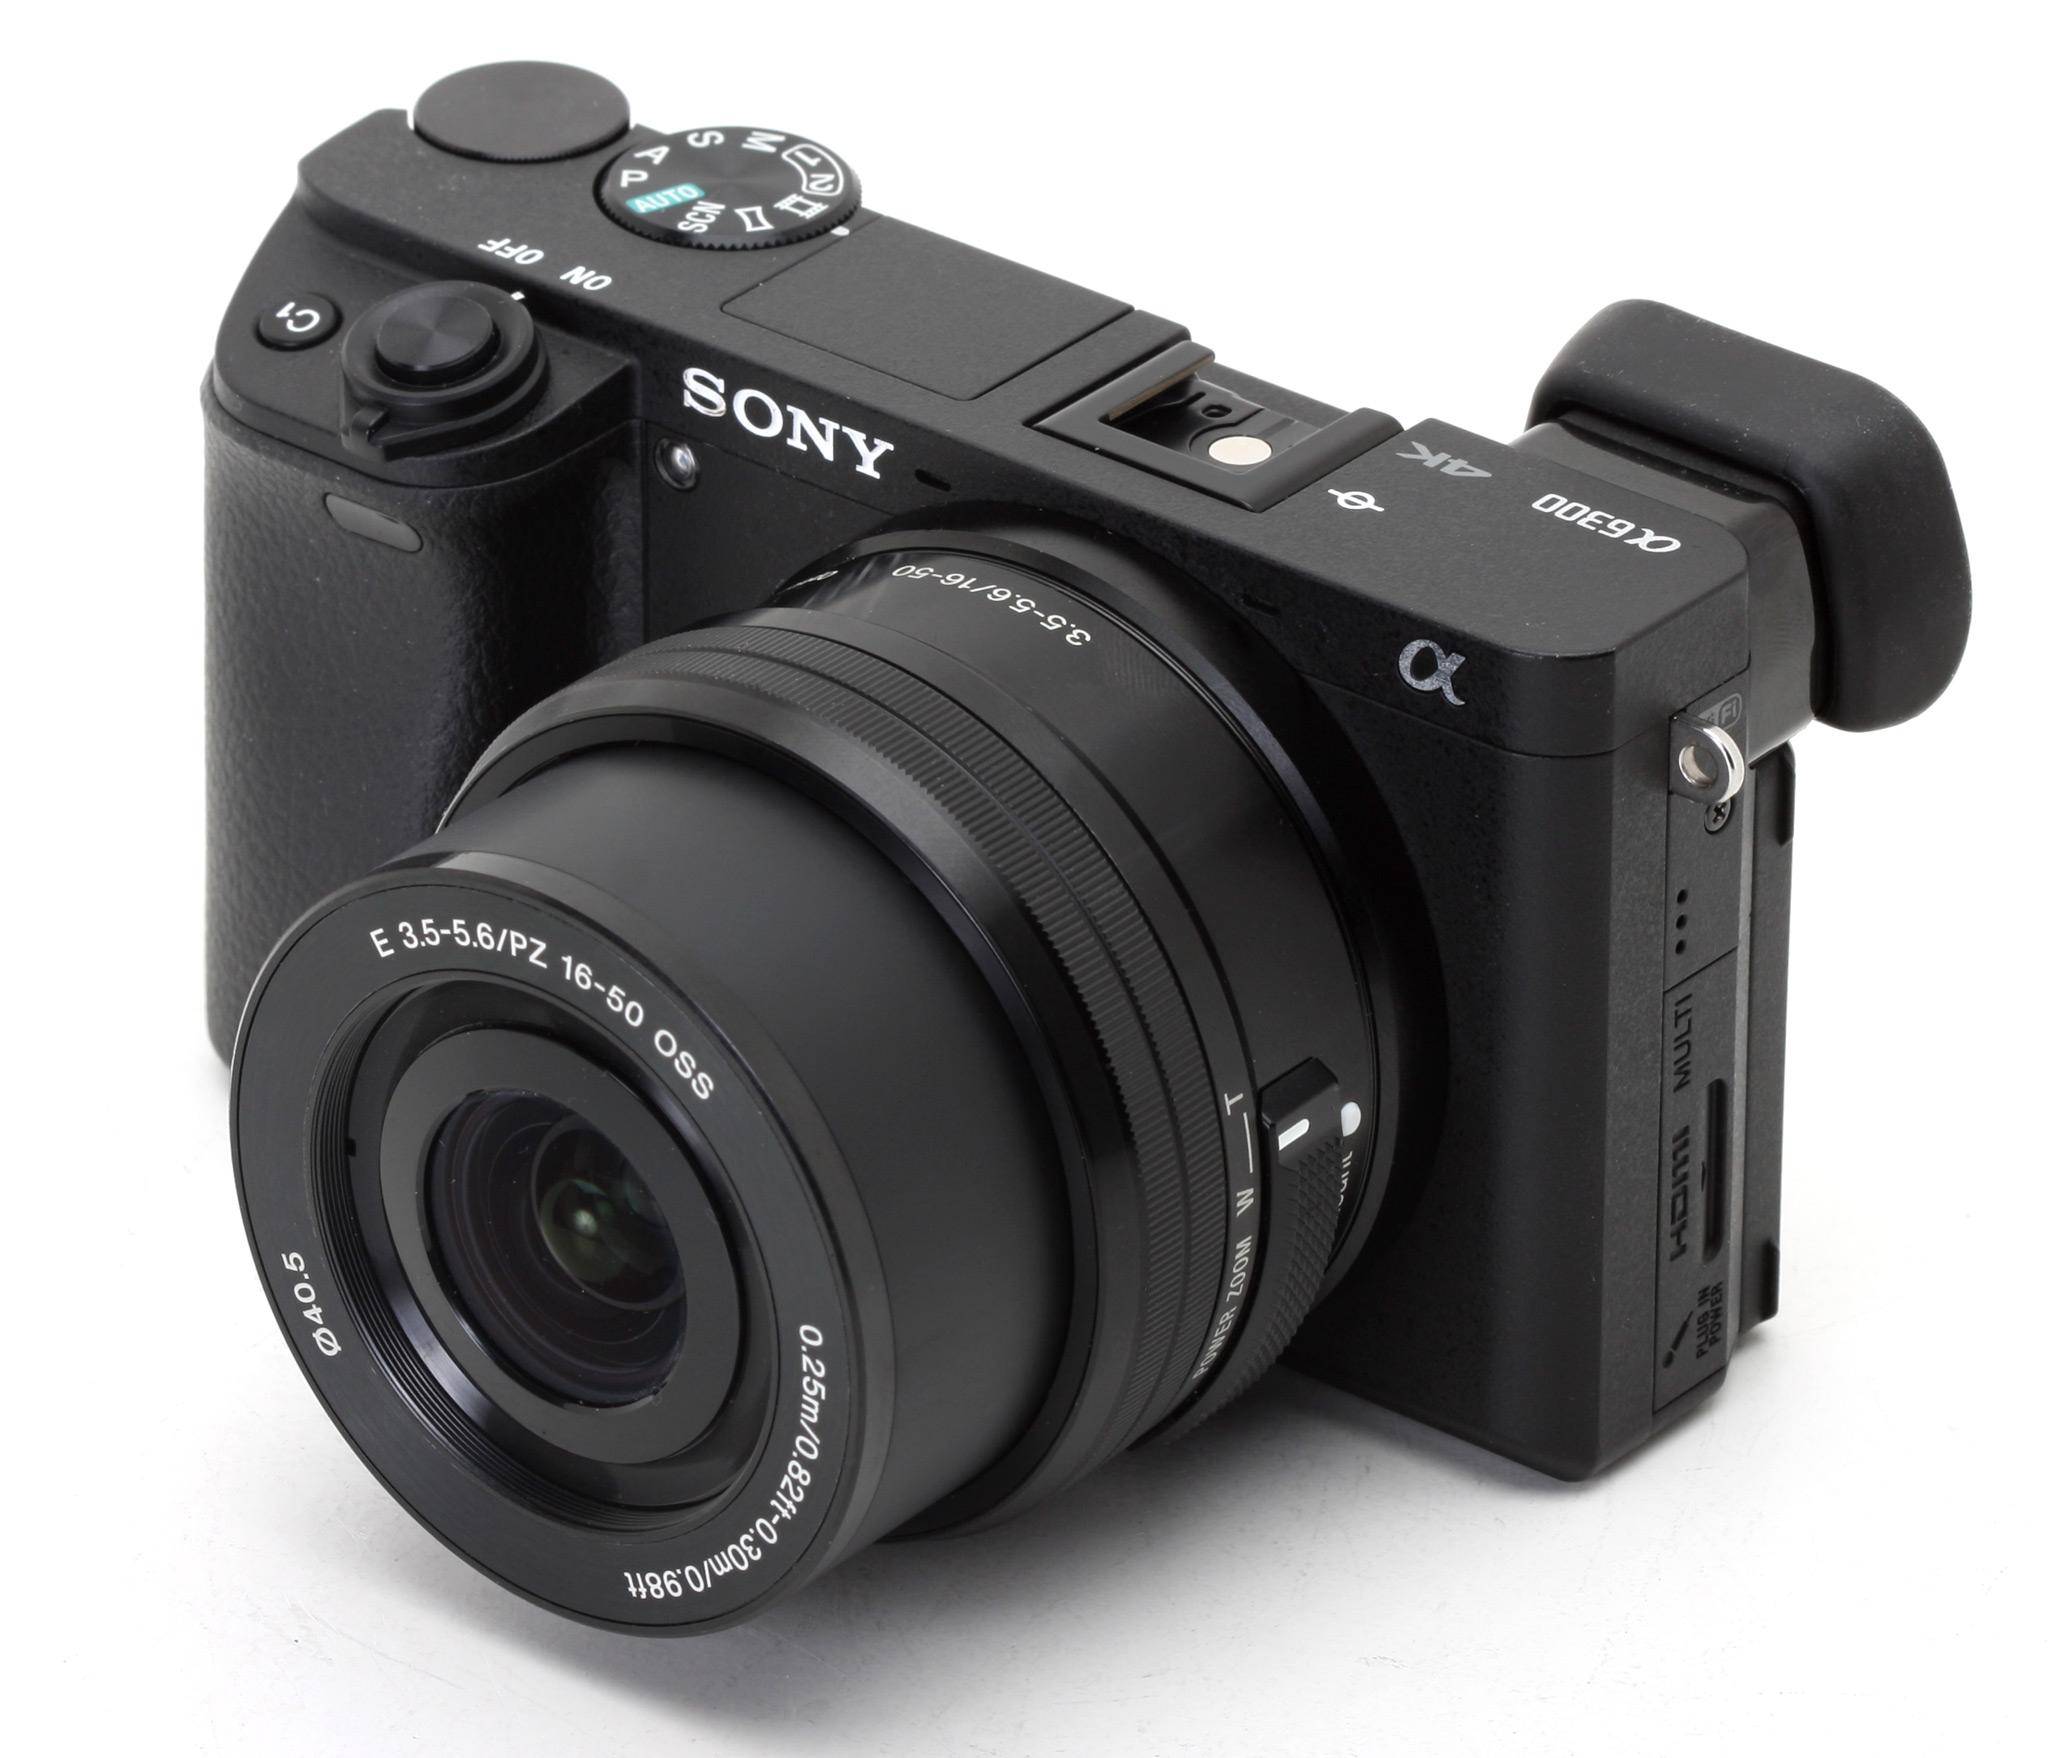 Aparat Sony A6300 + kit SEL 16-50mm 4K bezlusterkowiec